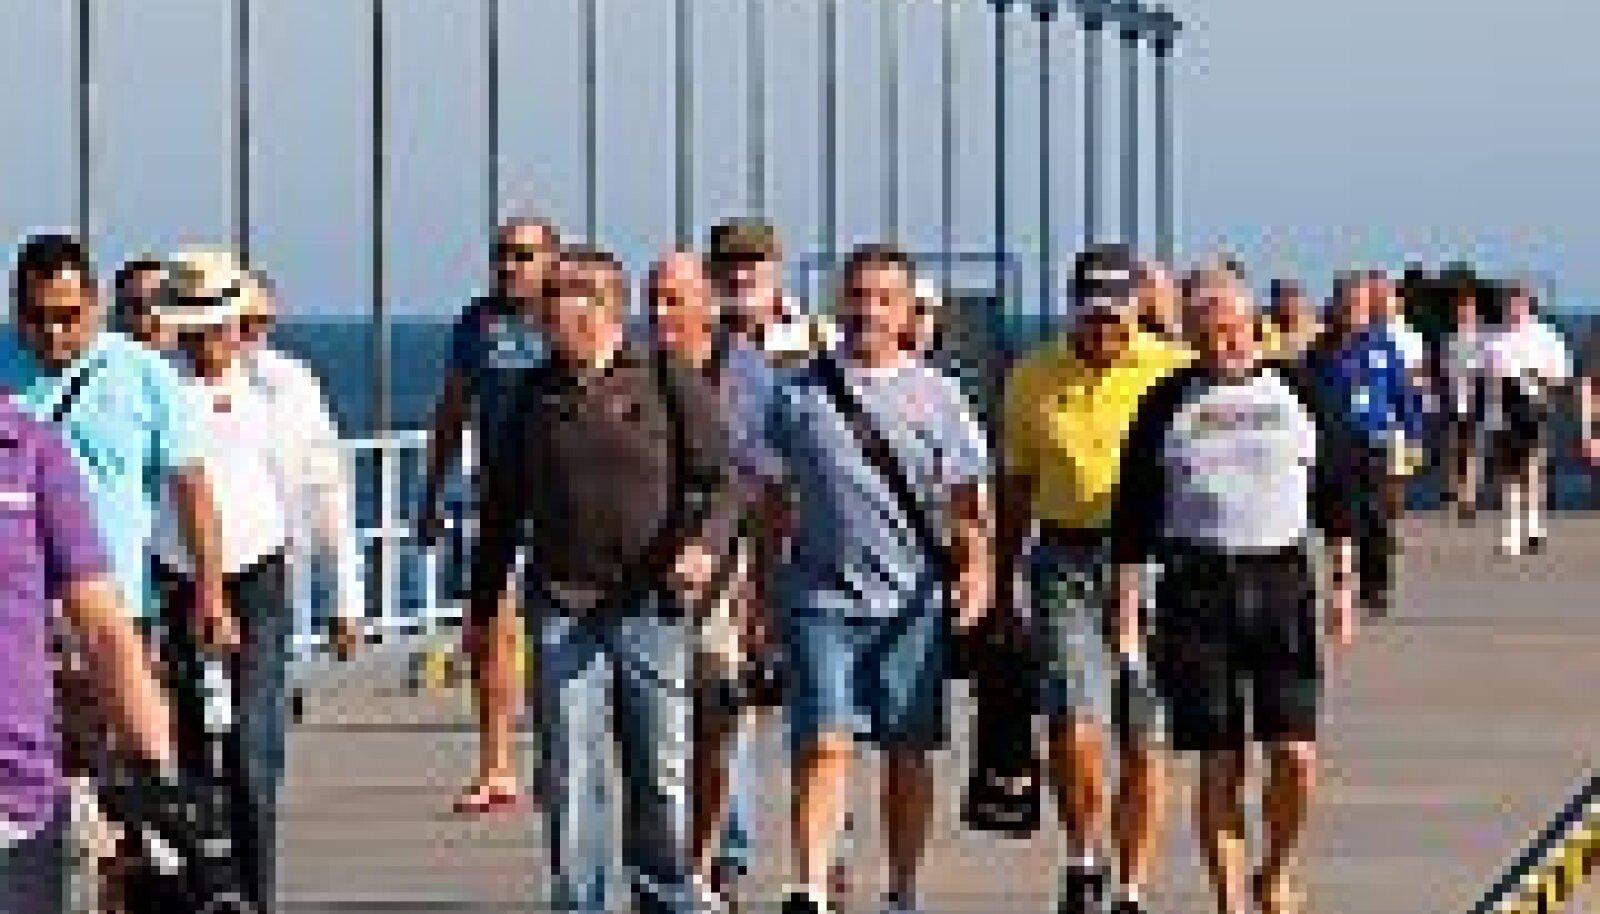 Homokruiis Summer Grand Baltic Cruise.